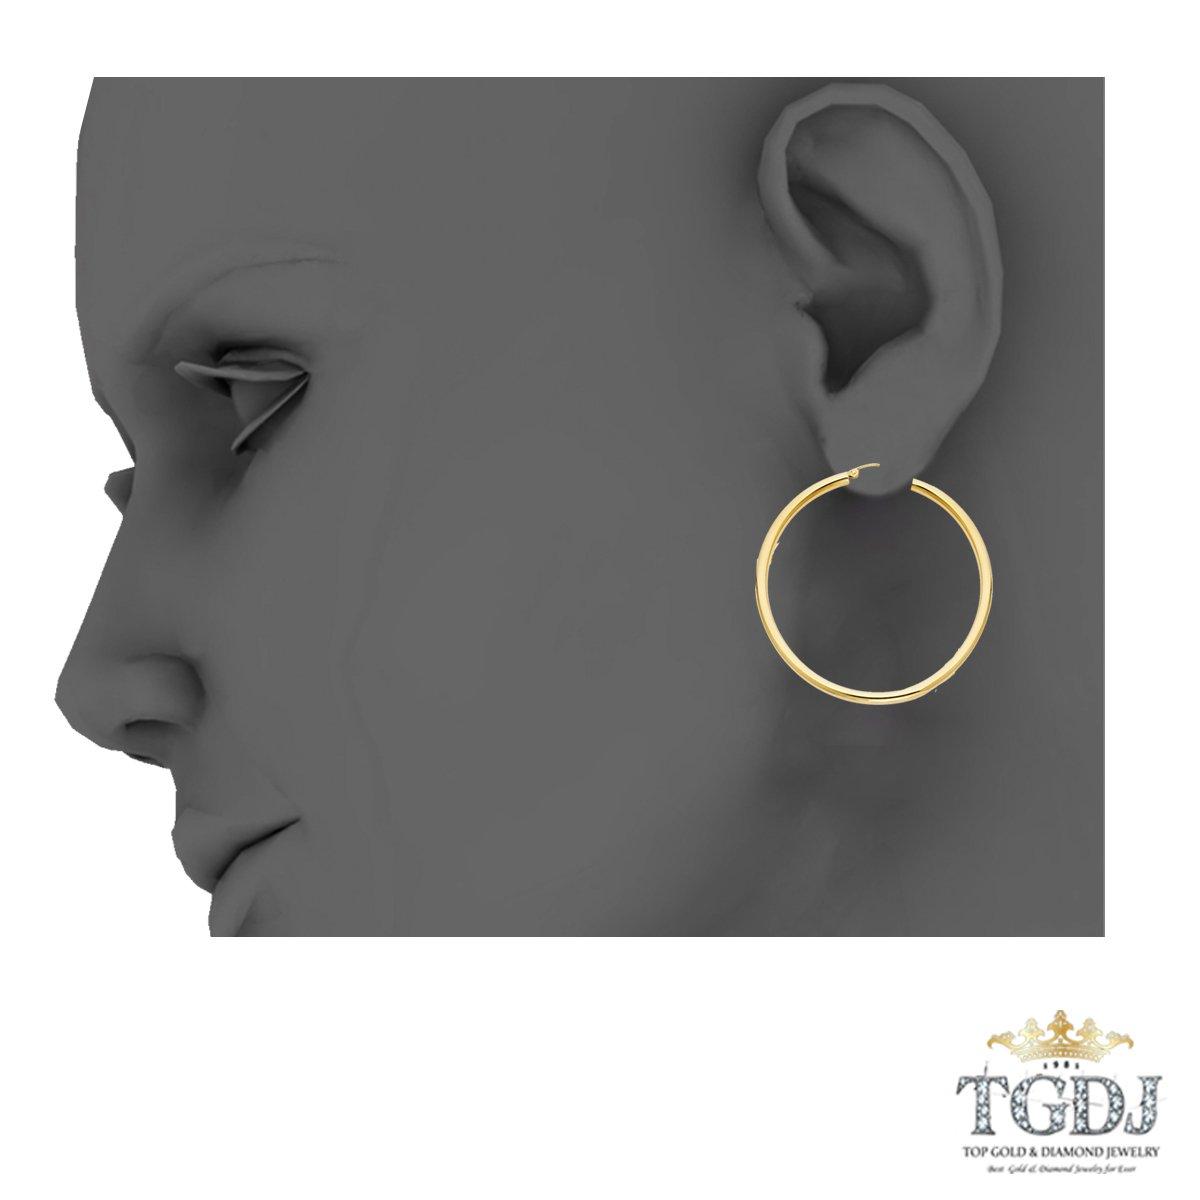 14k Yellow Gold 3mm Thickness Hinged Plain Hoop Earrings Diameter -28mm